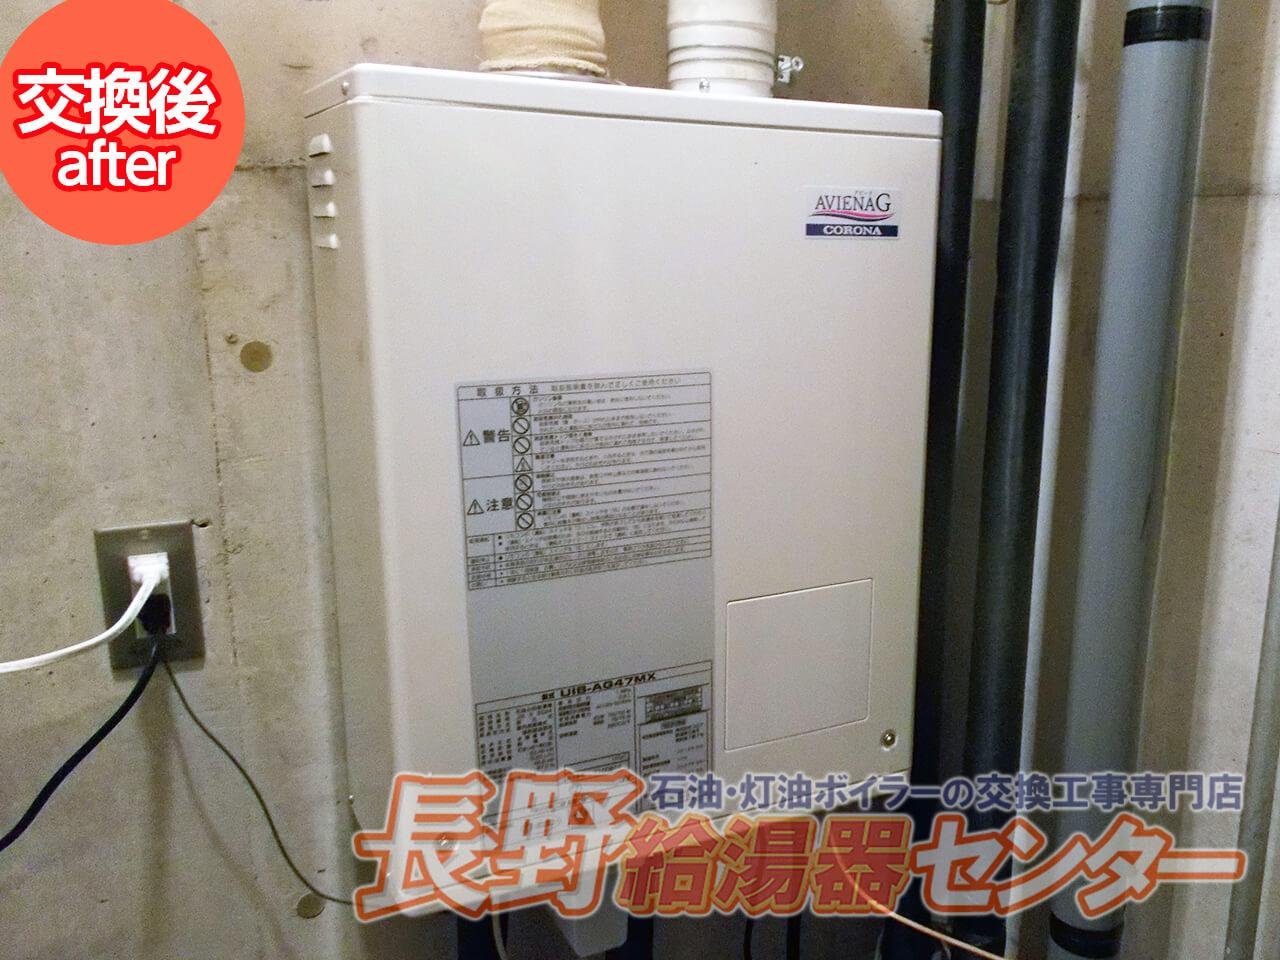 UIB-G4000HTからUIB-AG47MX(FFW)へ交換工事